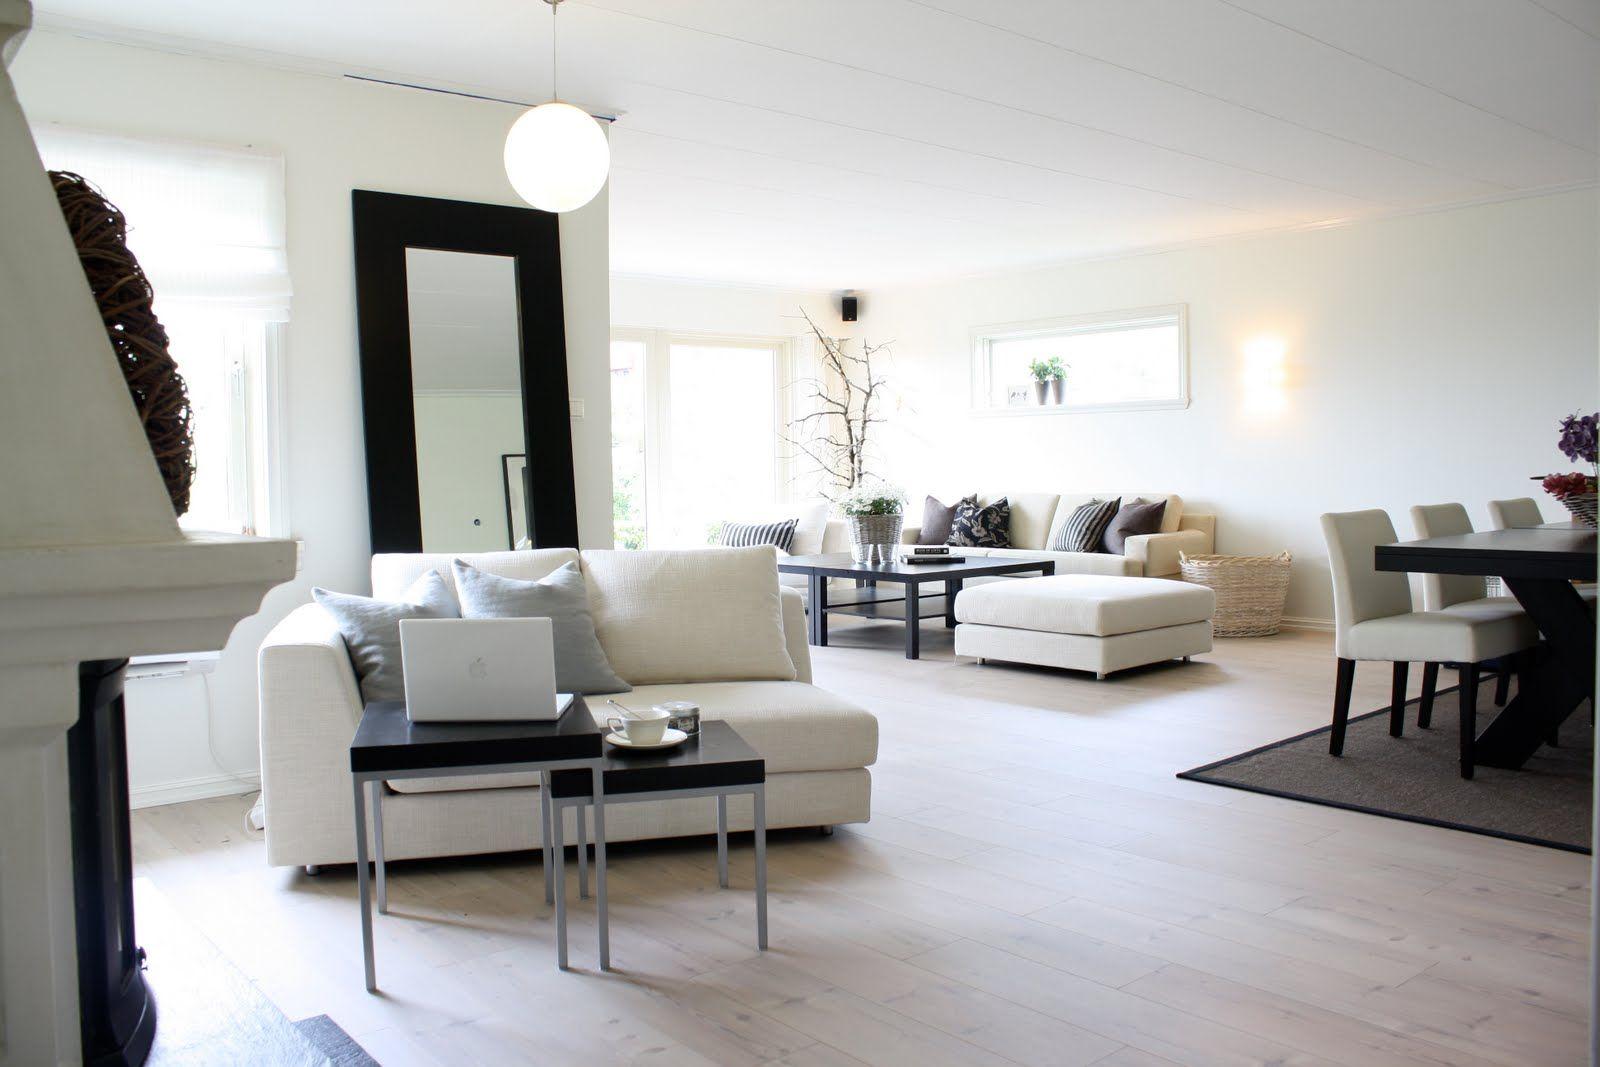 essex sofa slettvoll - Google-s?k Slettvoll Pinterest Sofas